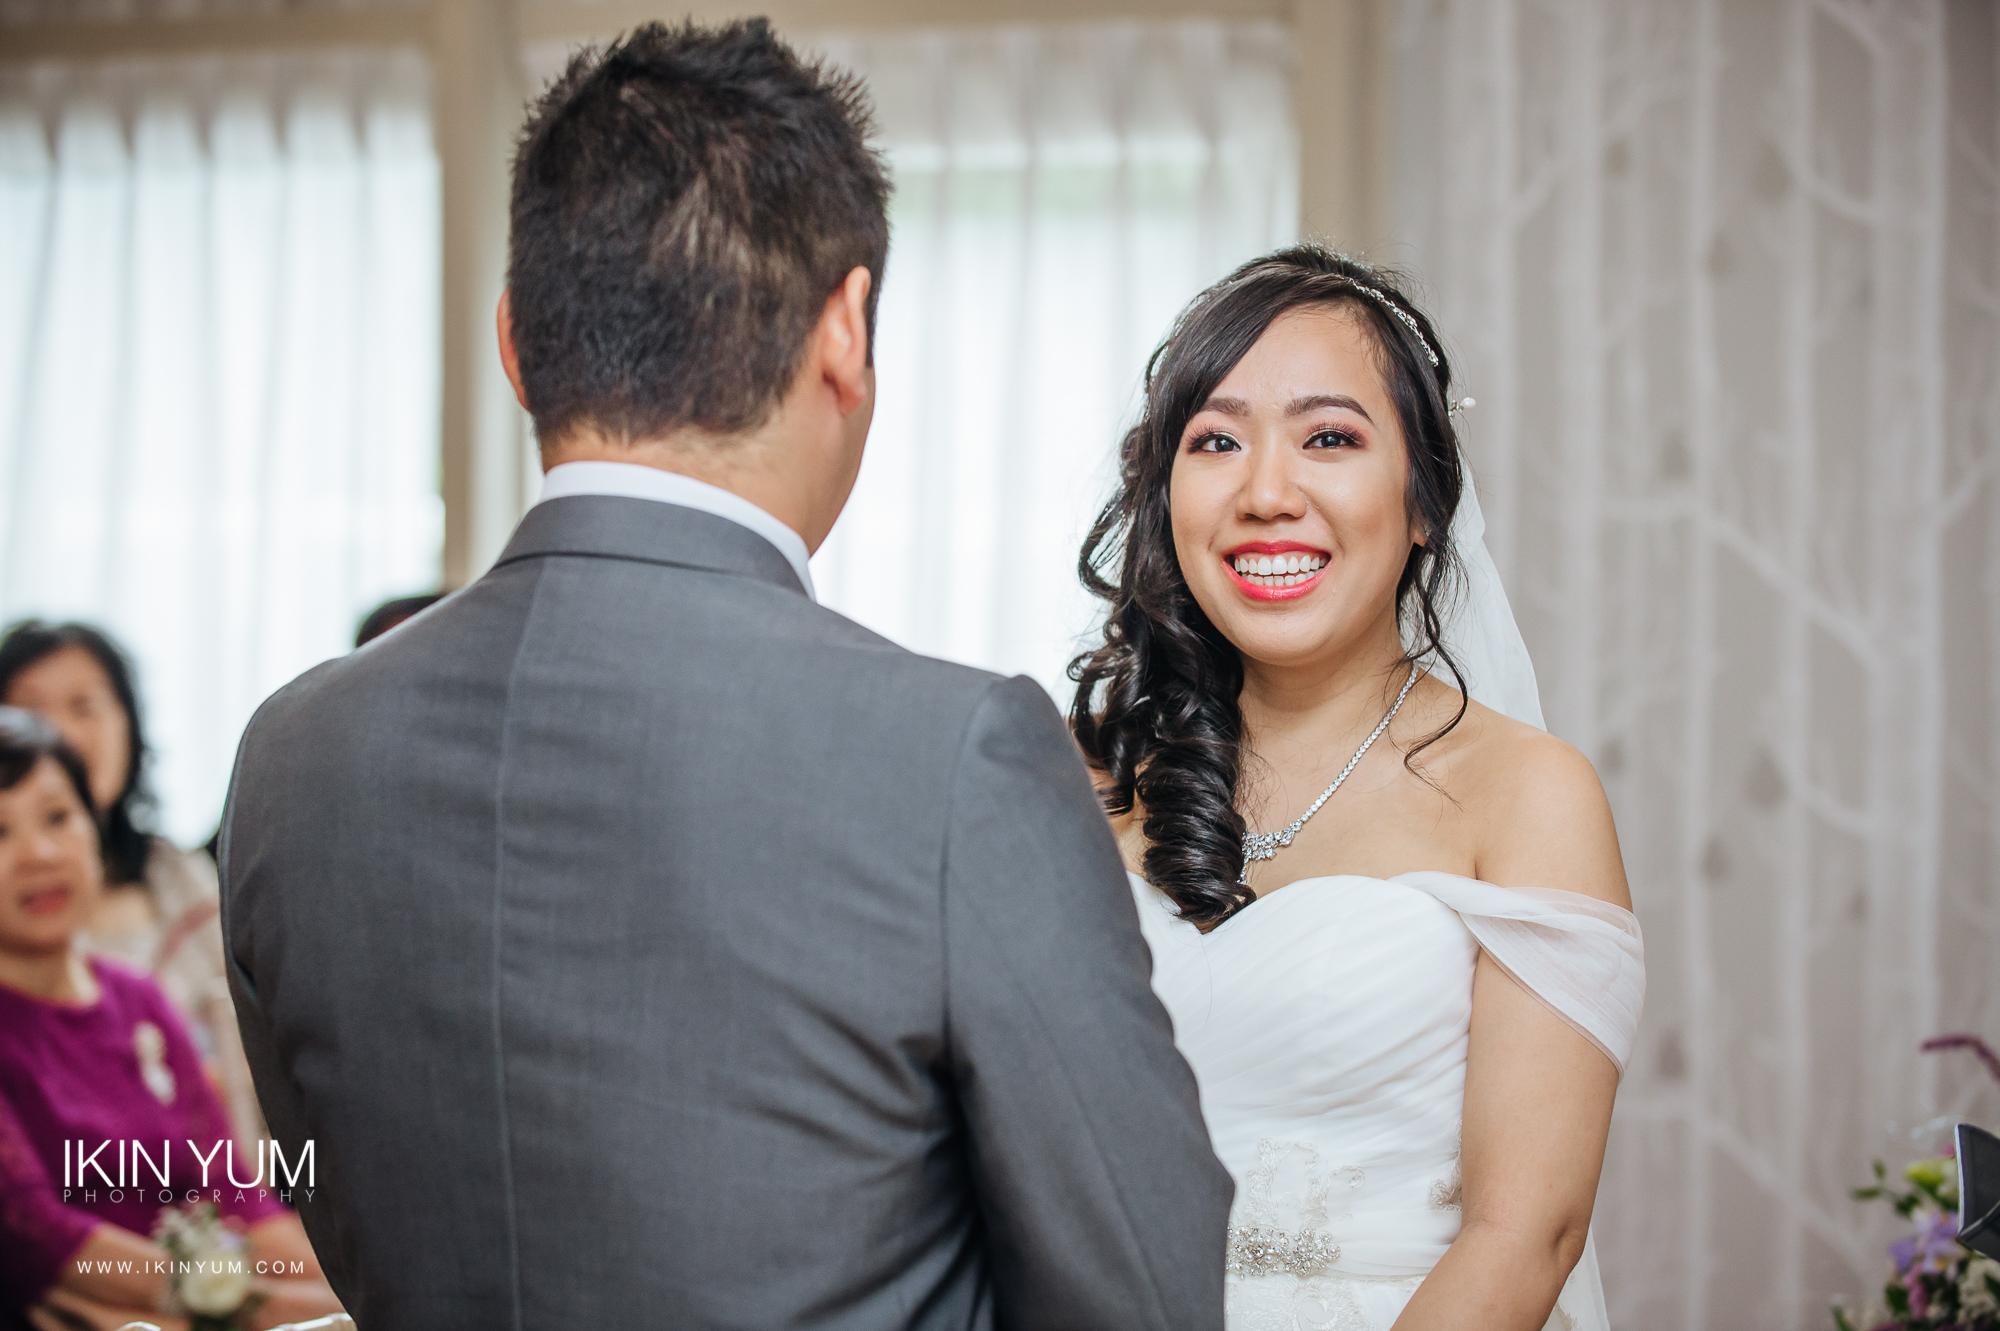 Hampton Manor Wedding - Ikin Yum Photography -077.jpg